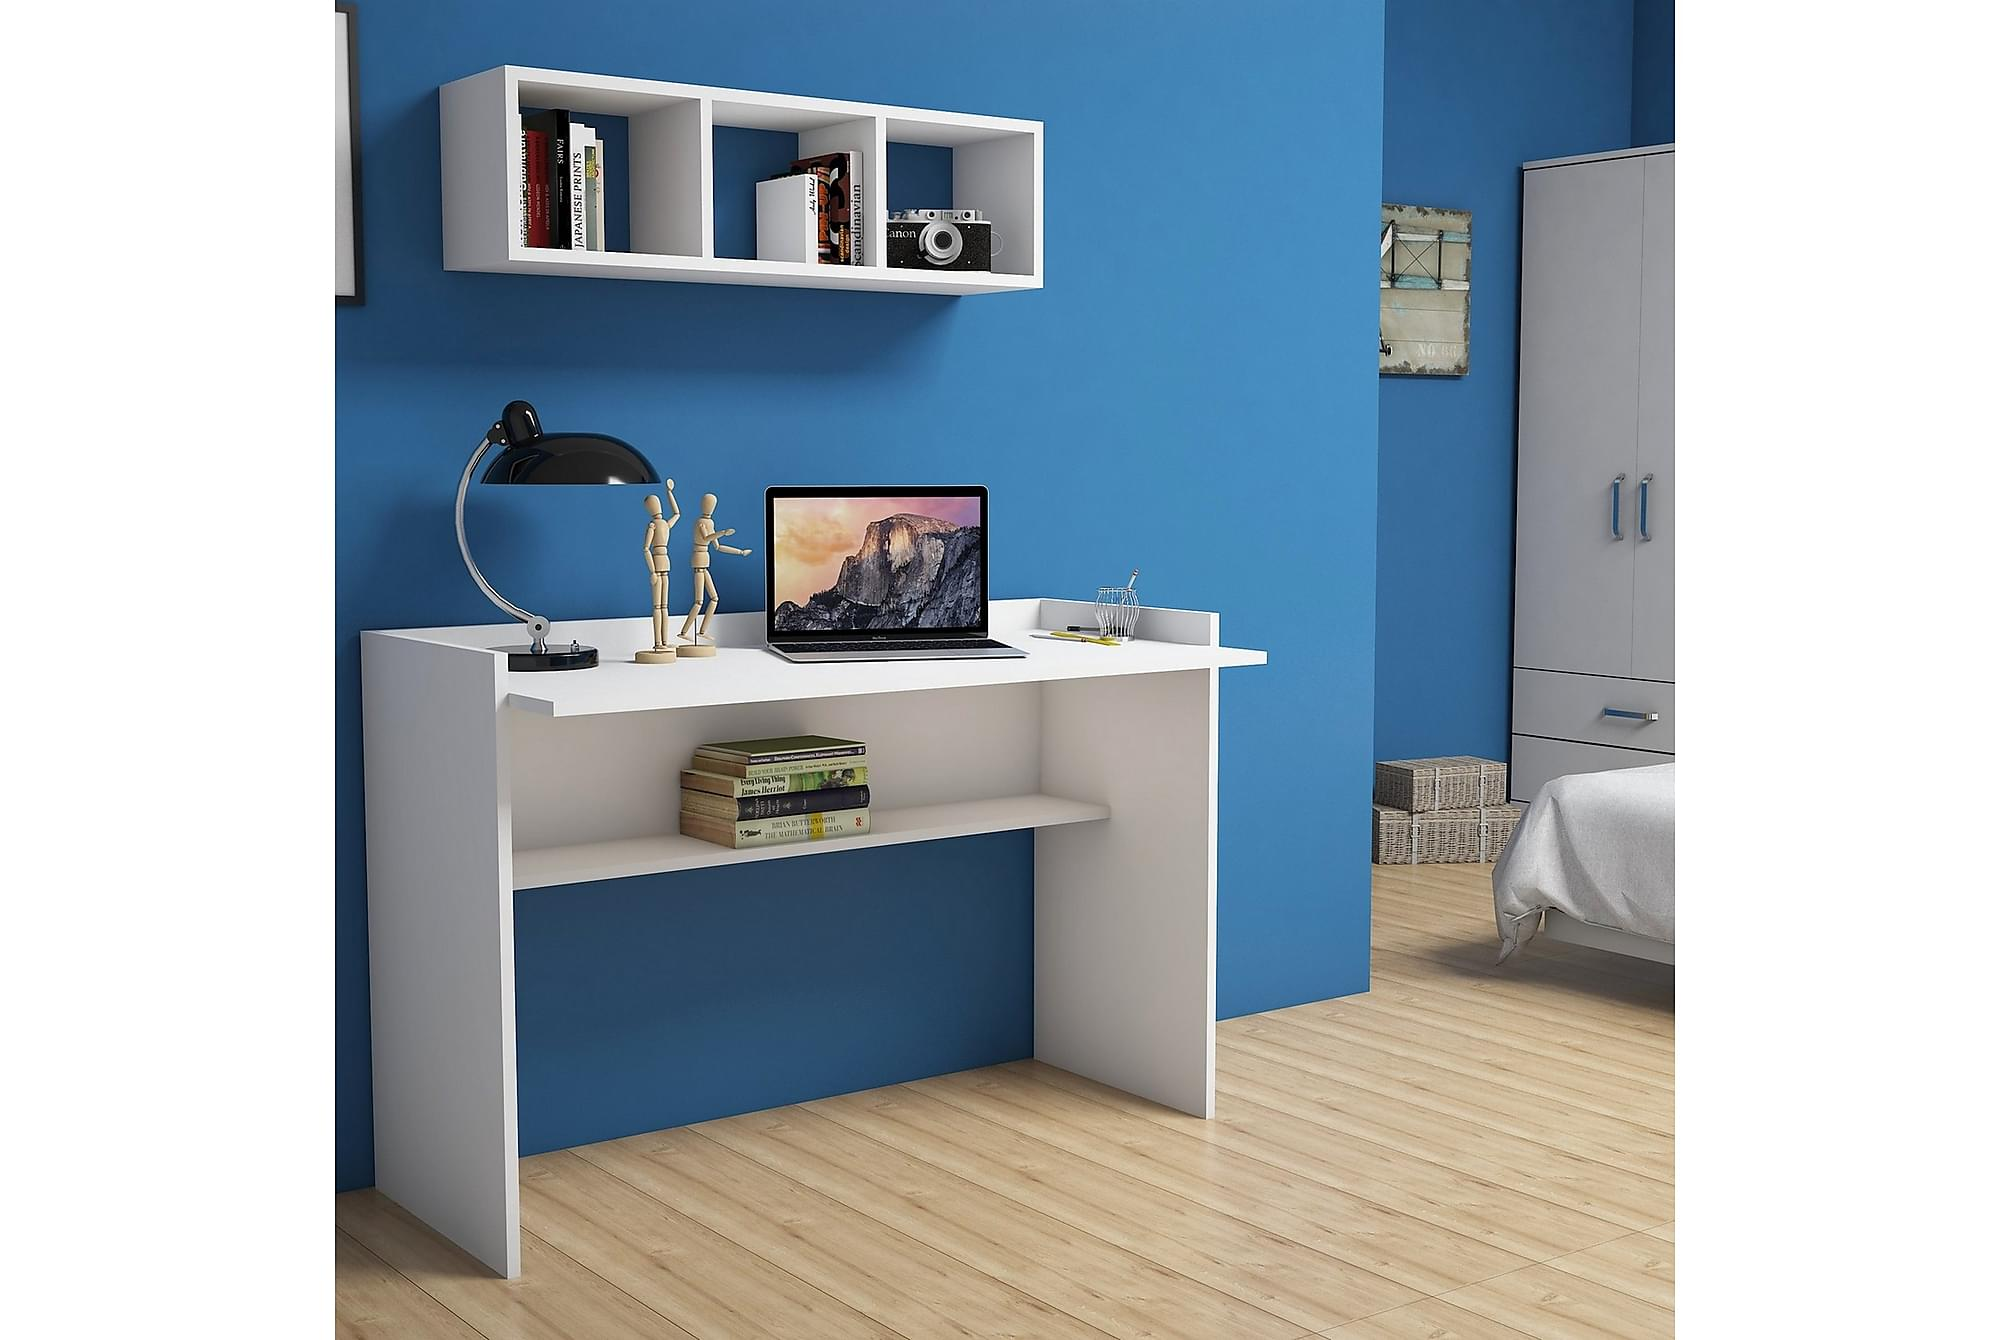 BRATCHER Skrivbord 118 cm Vit, Datorbord